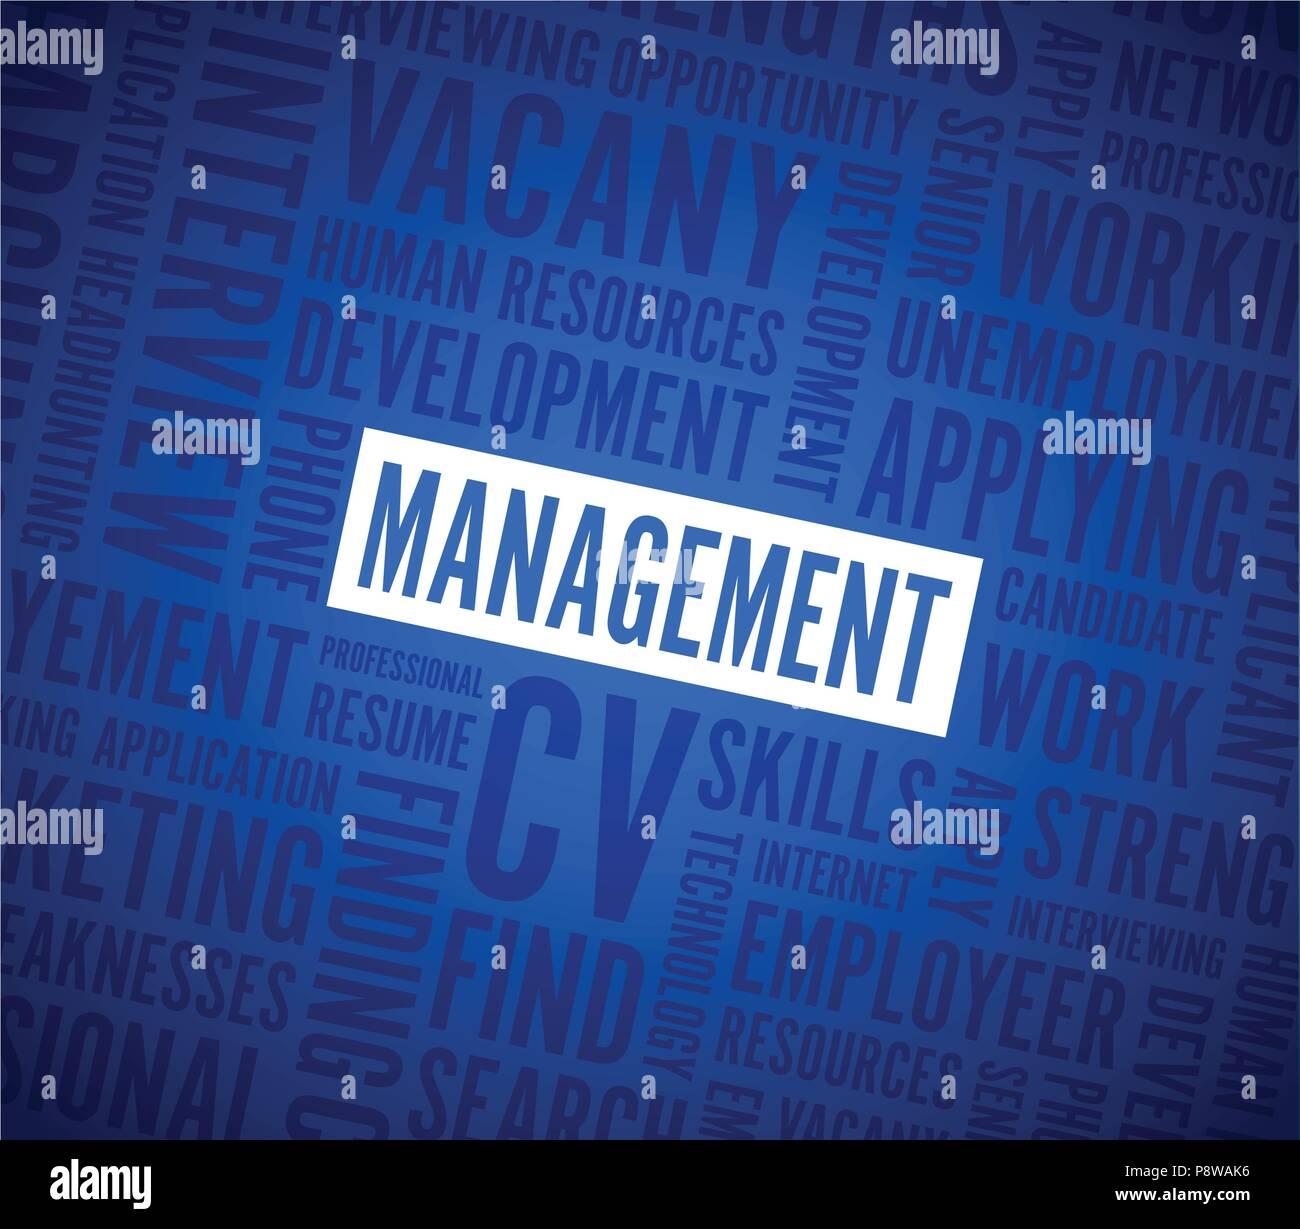 management text background - Stock Image